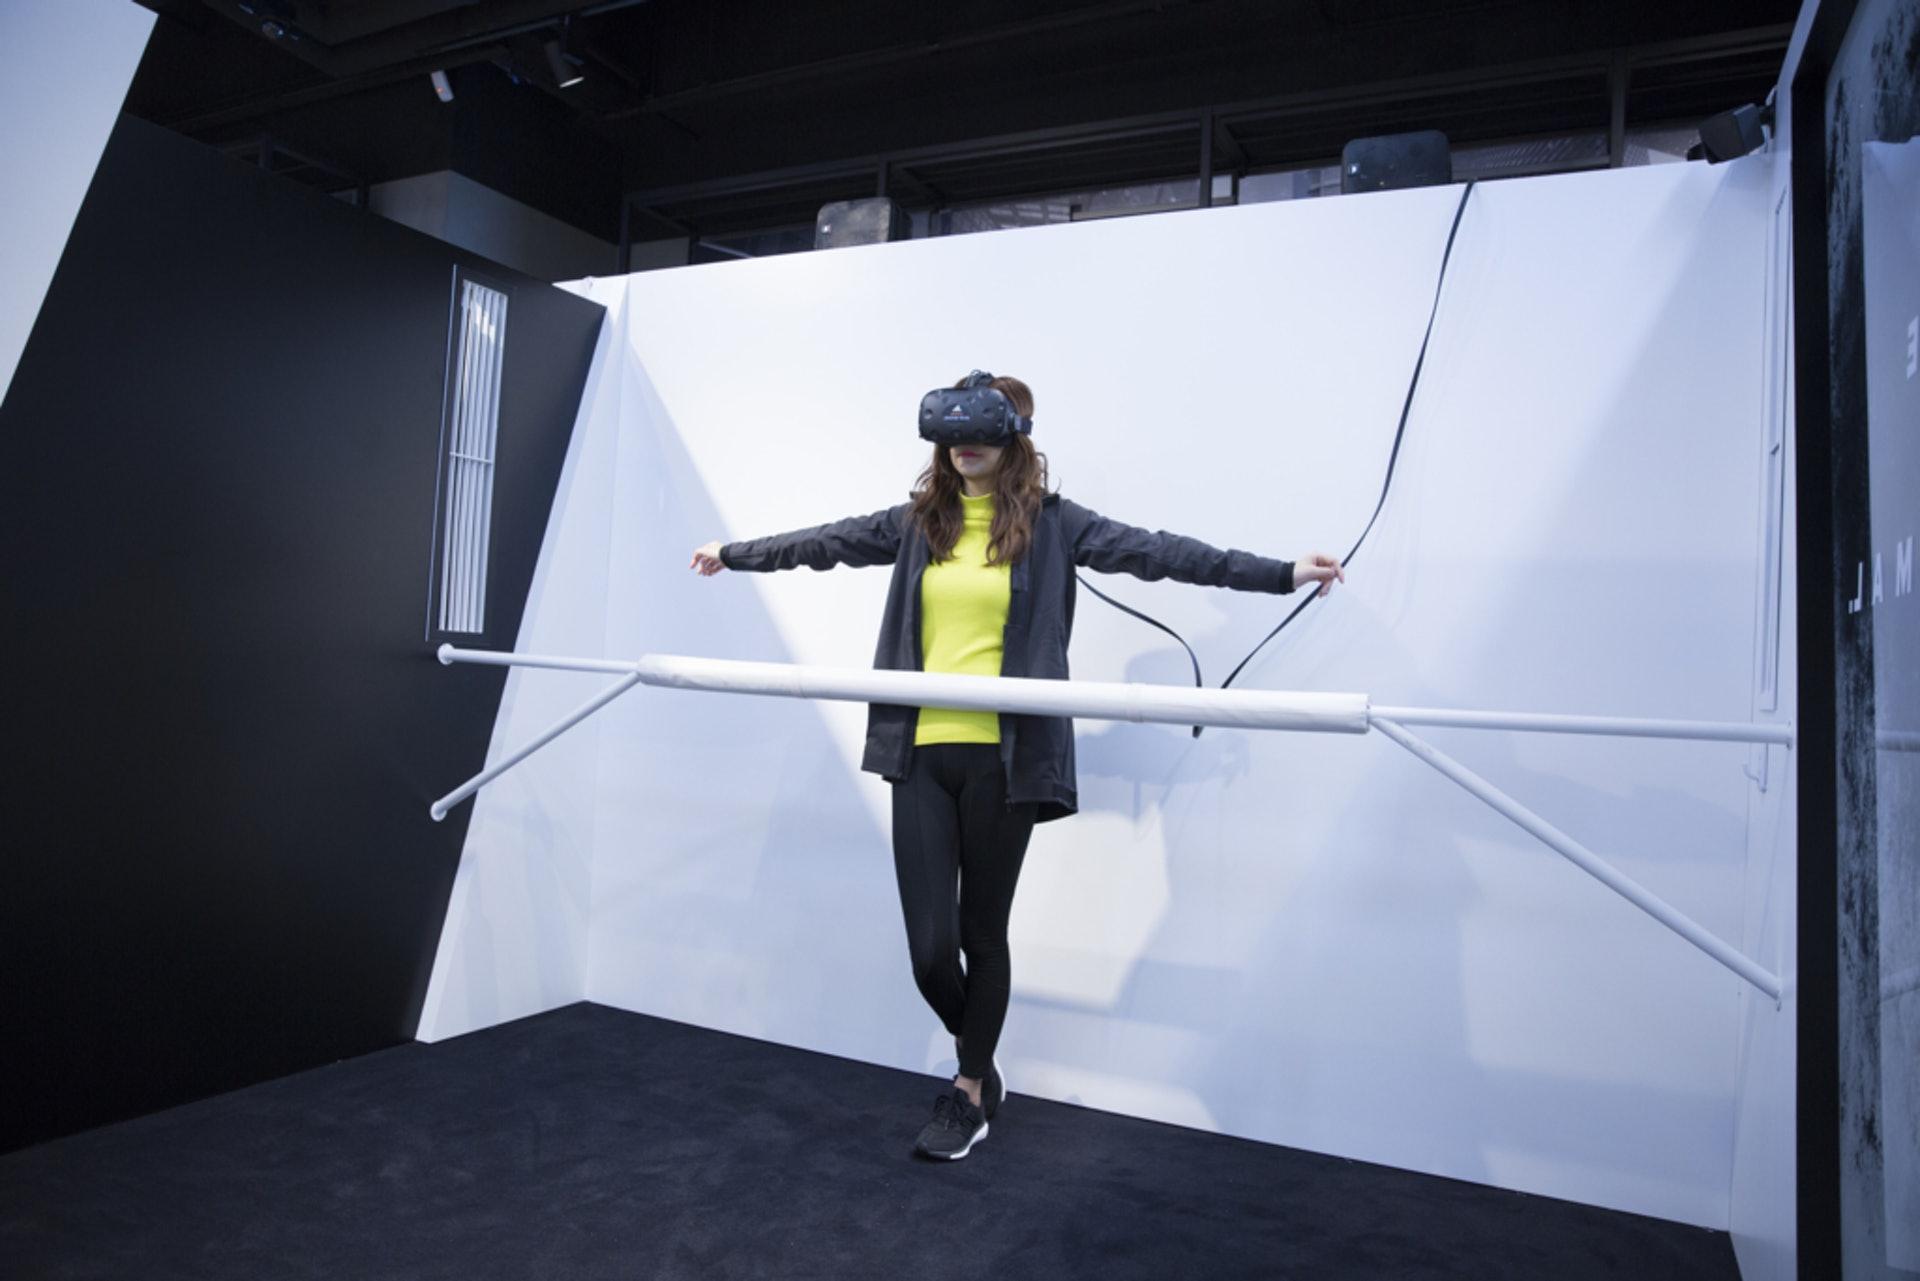 ADIDAS CLIMAHEAT VR SNOW RUN 9